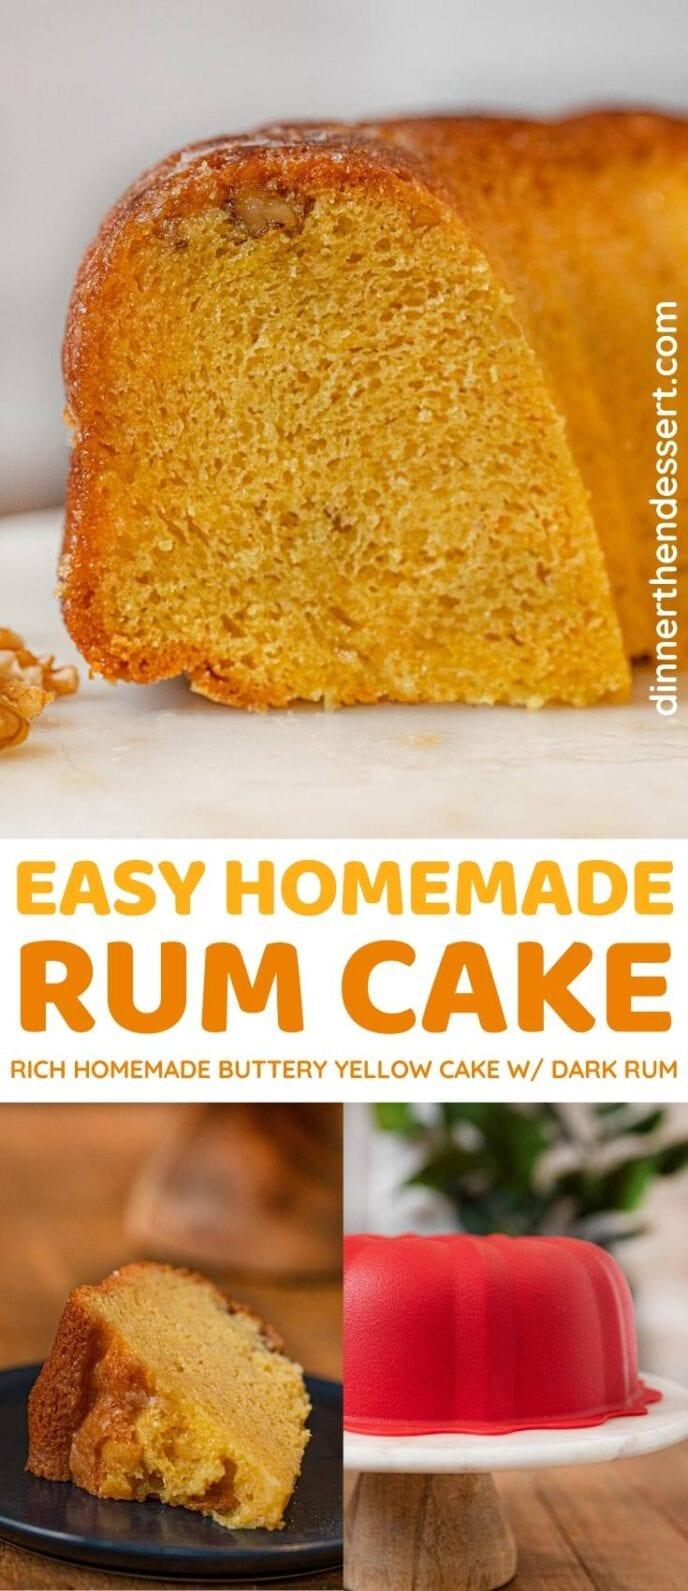 Easy Rum Cake collage